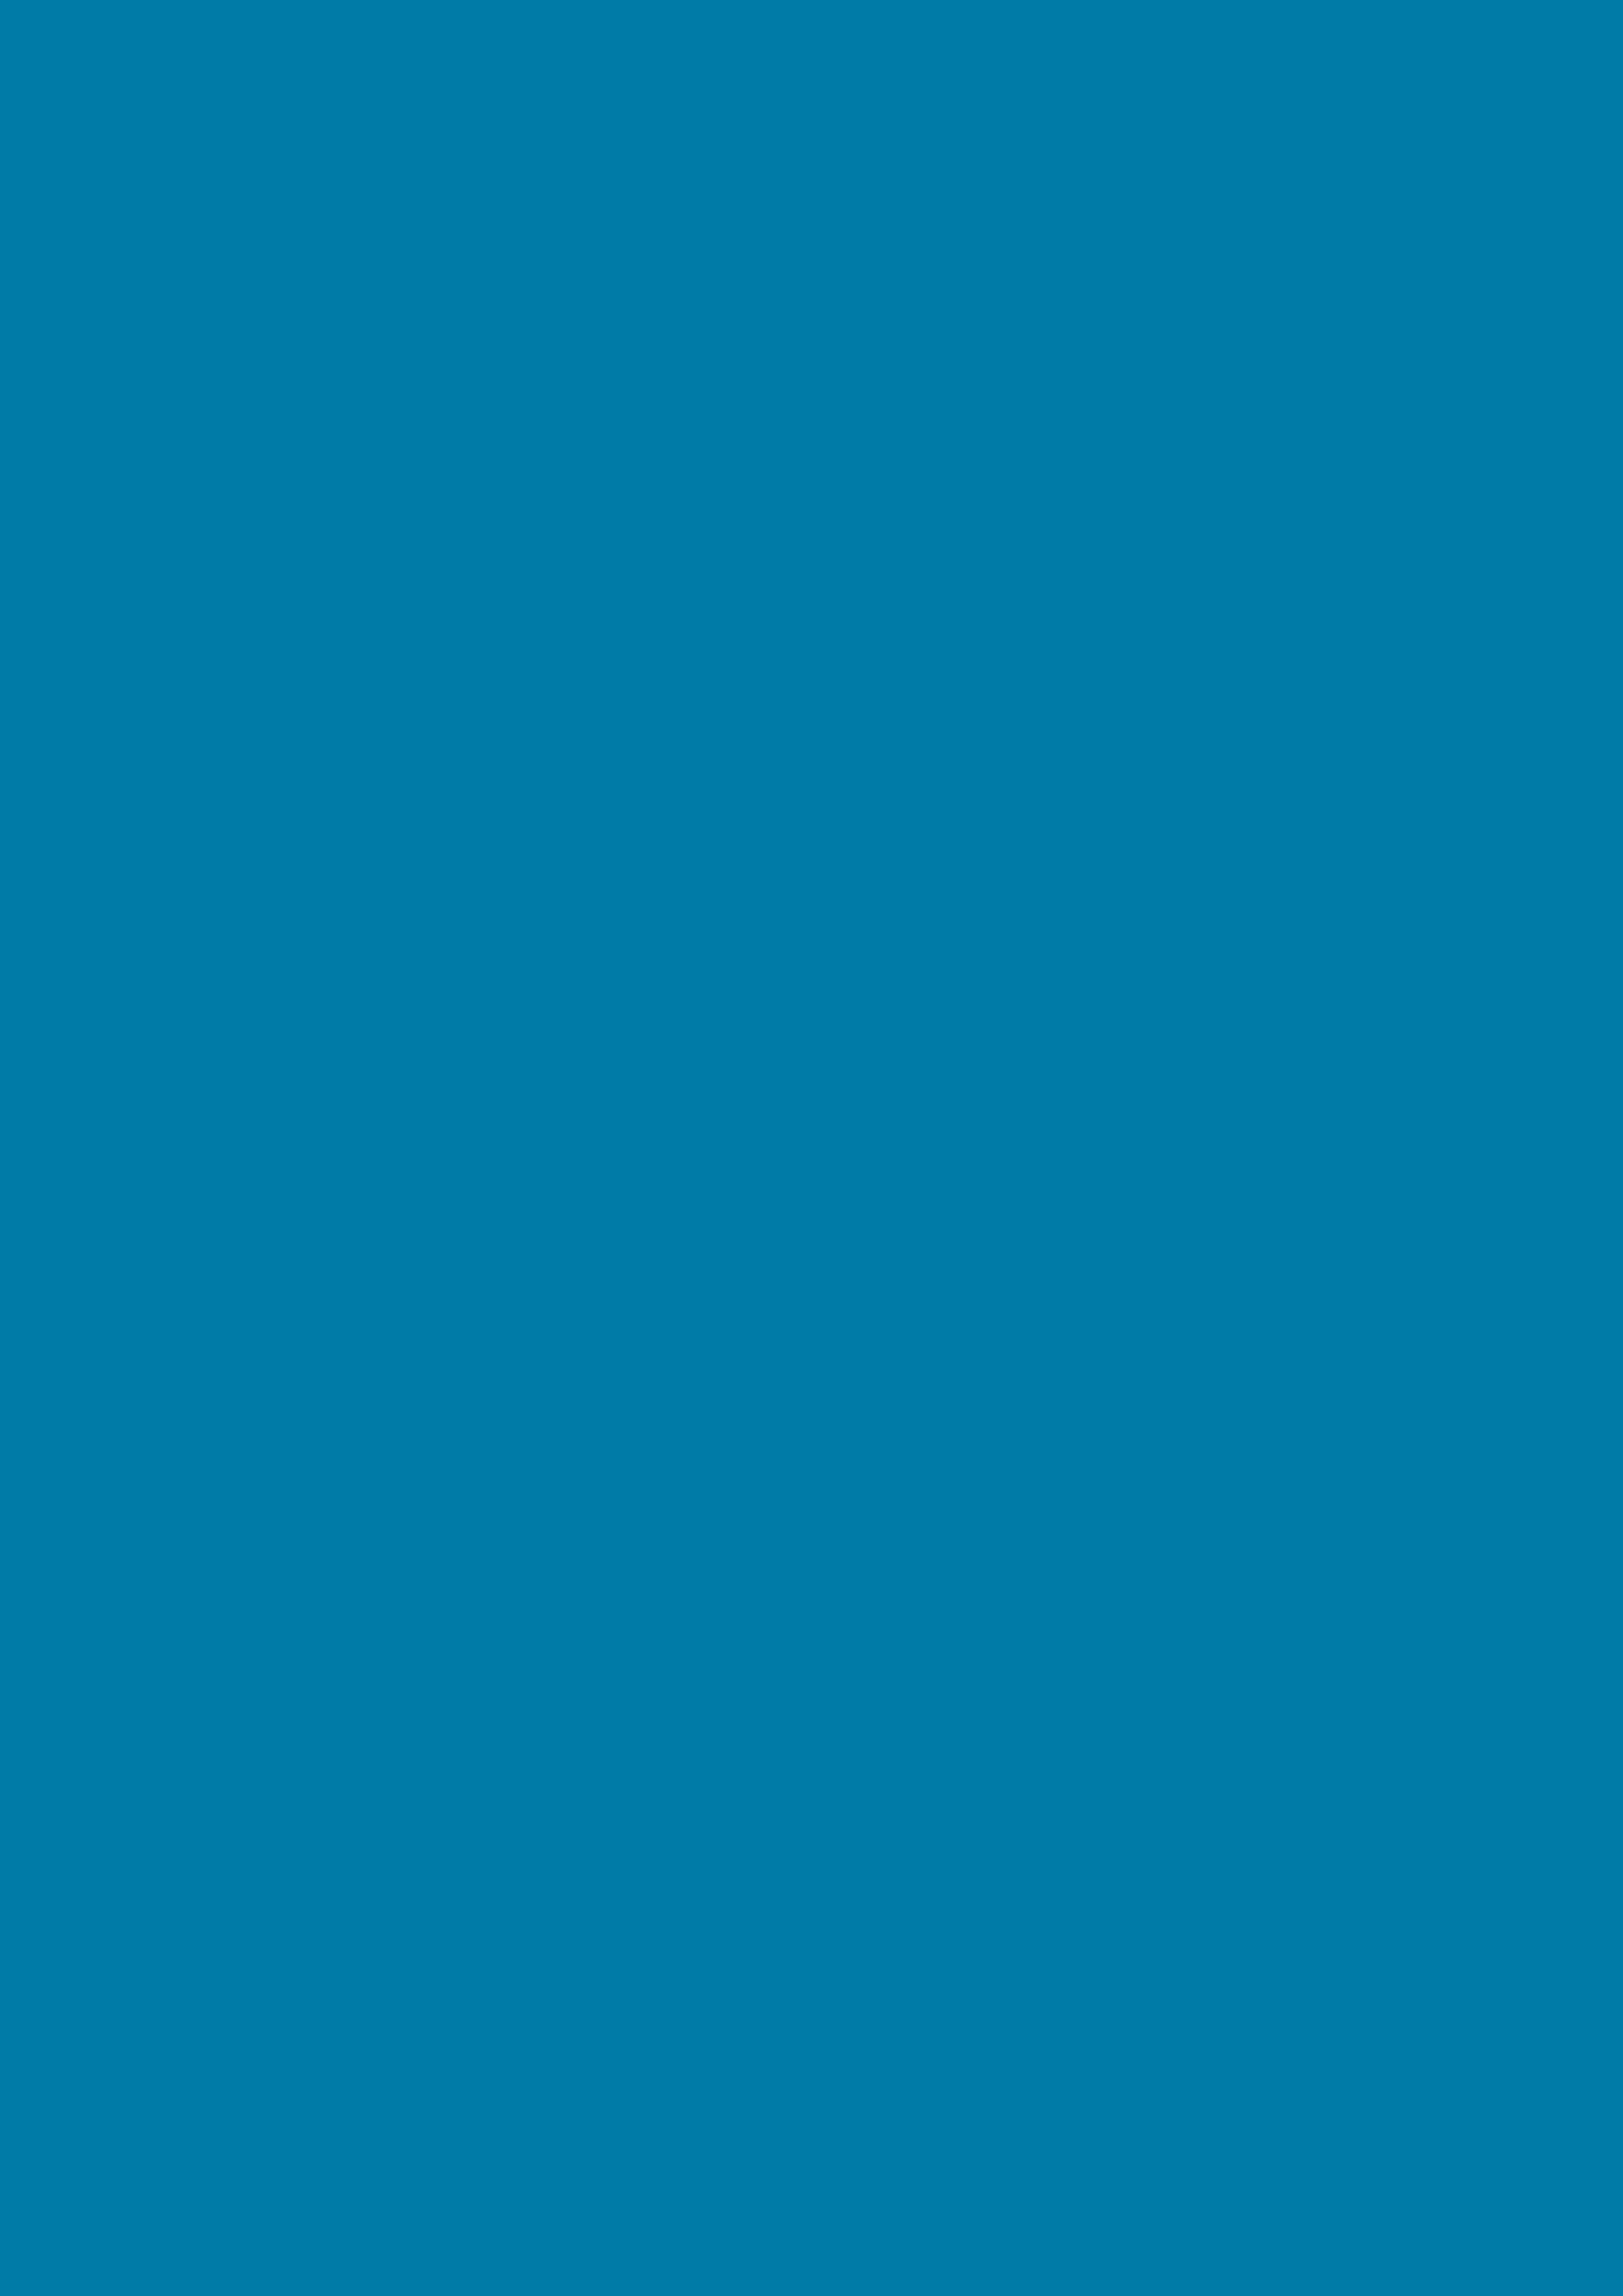 2480x3508 Celadon Blue Solid Color Background